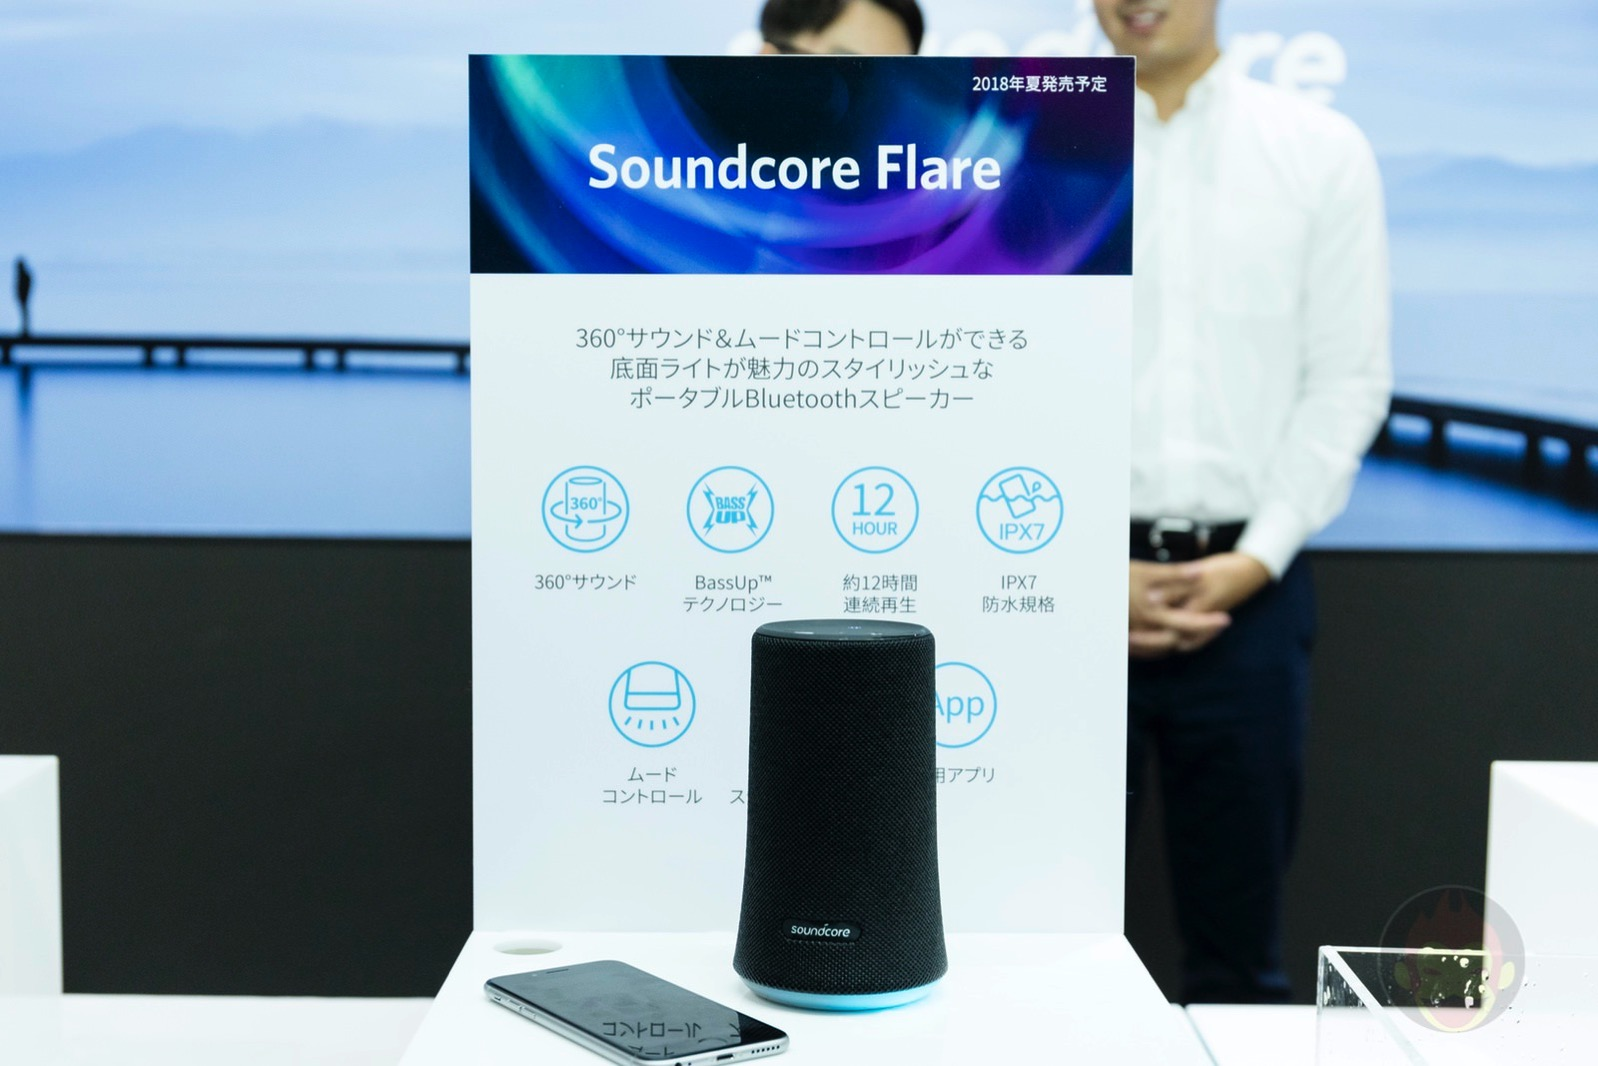 Anker SoundCore Flare 01